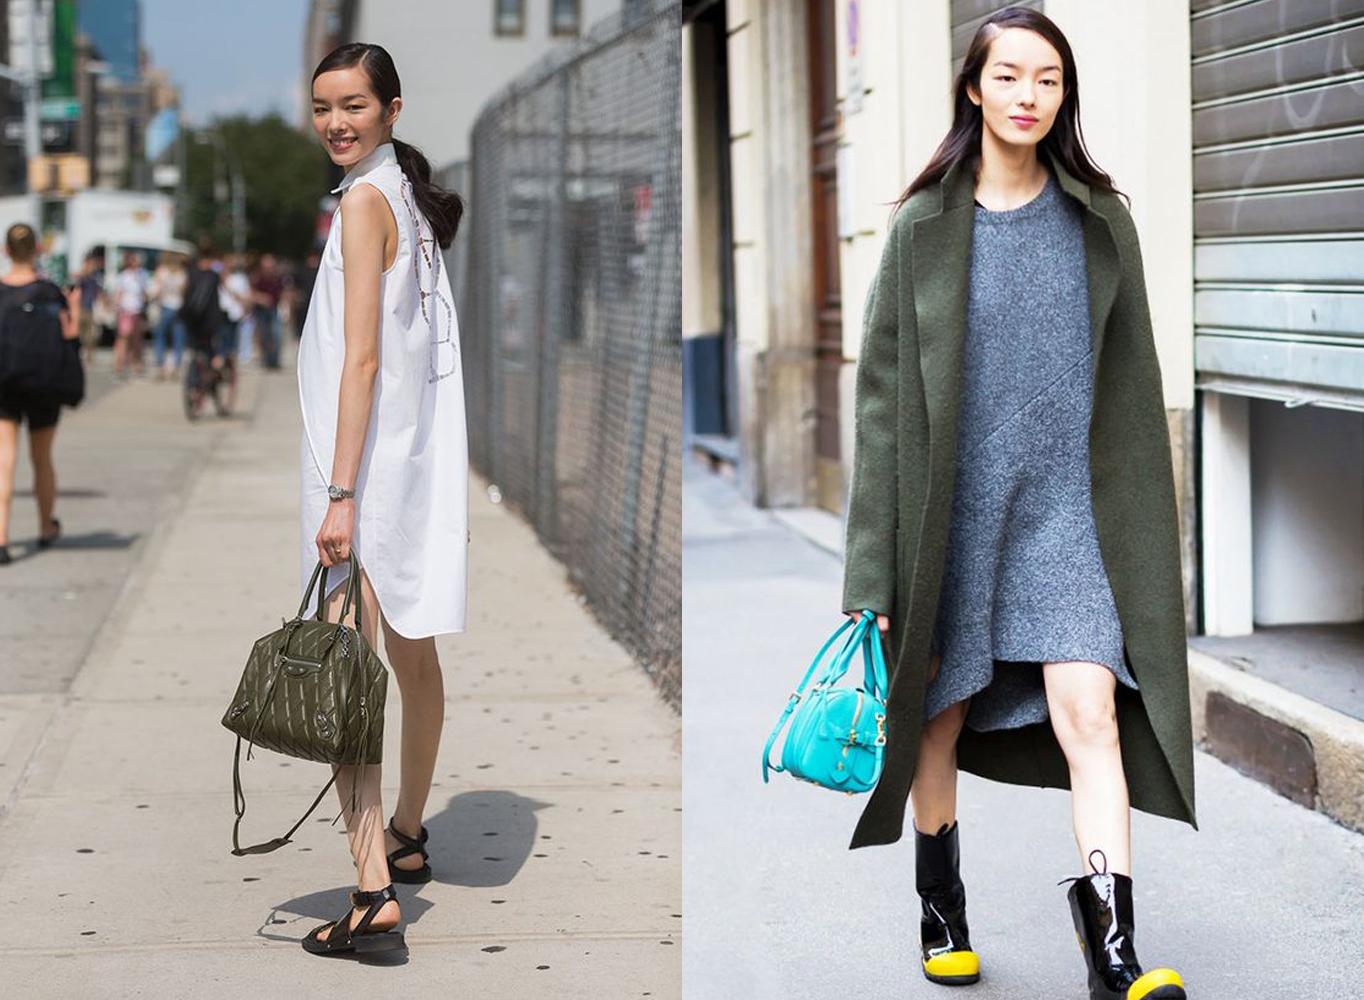 Fei Fei Sun off suty, street style outfit